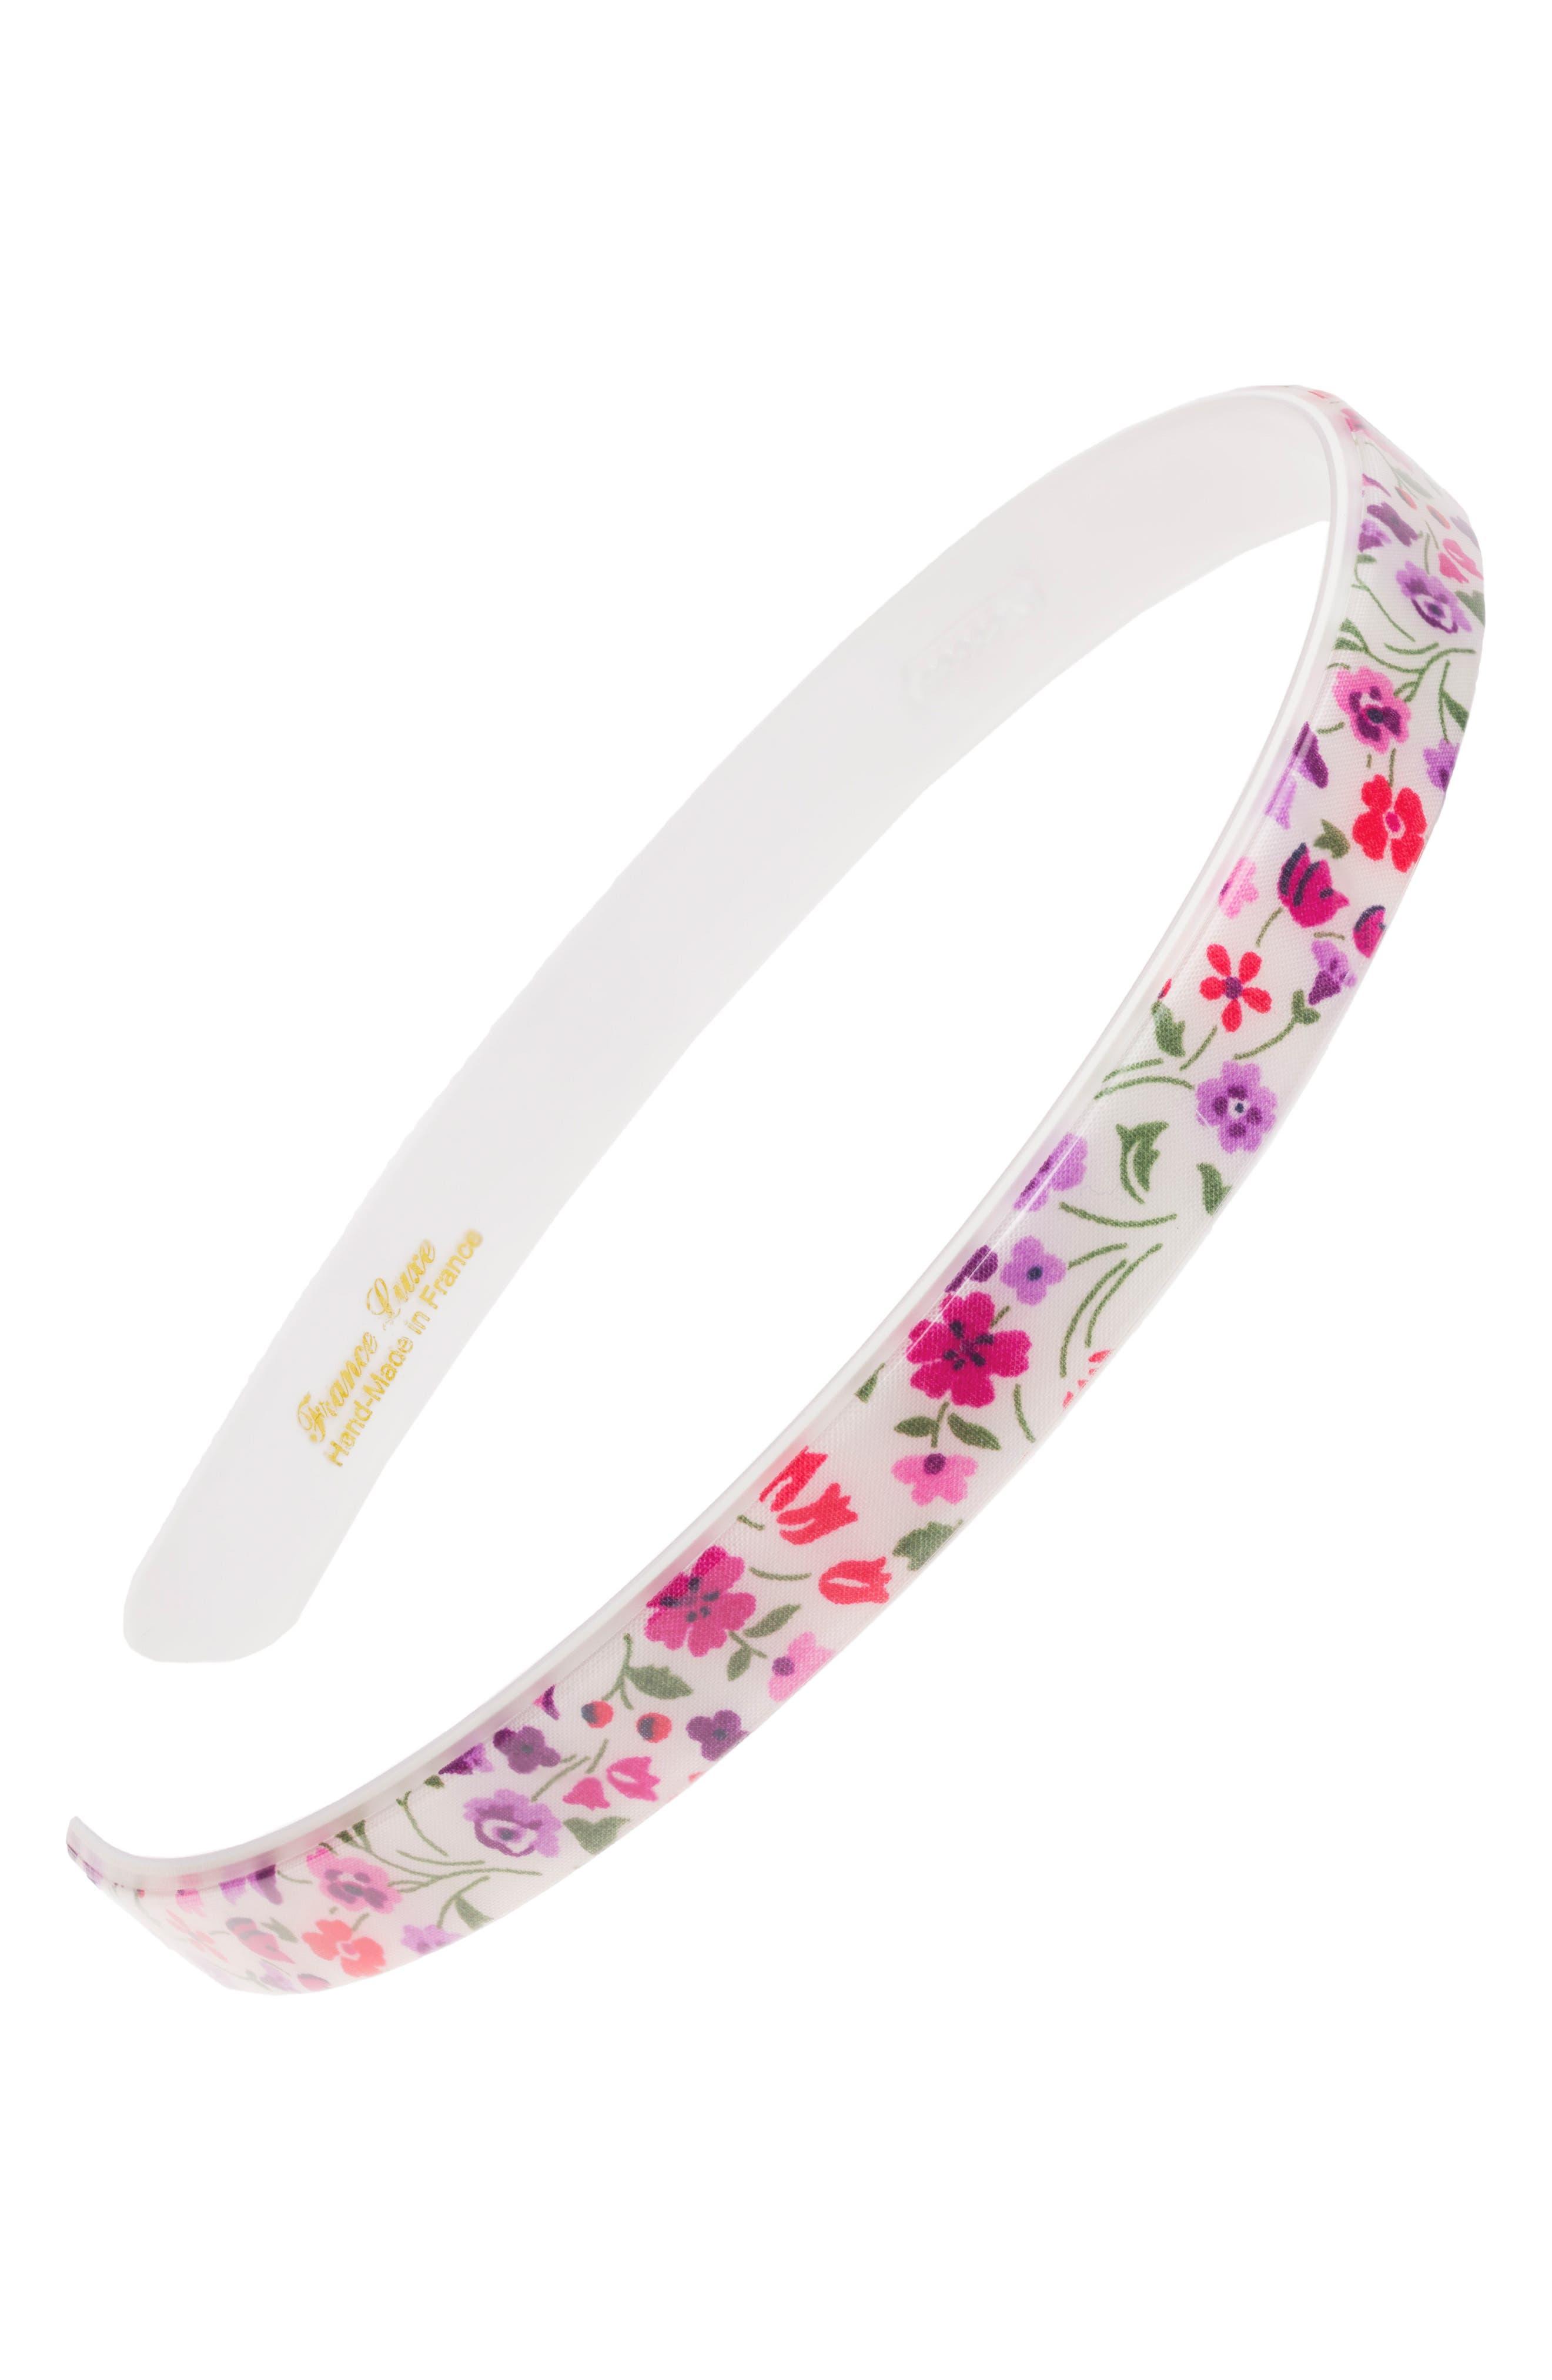 France Luxe Skinny Headband